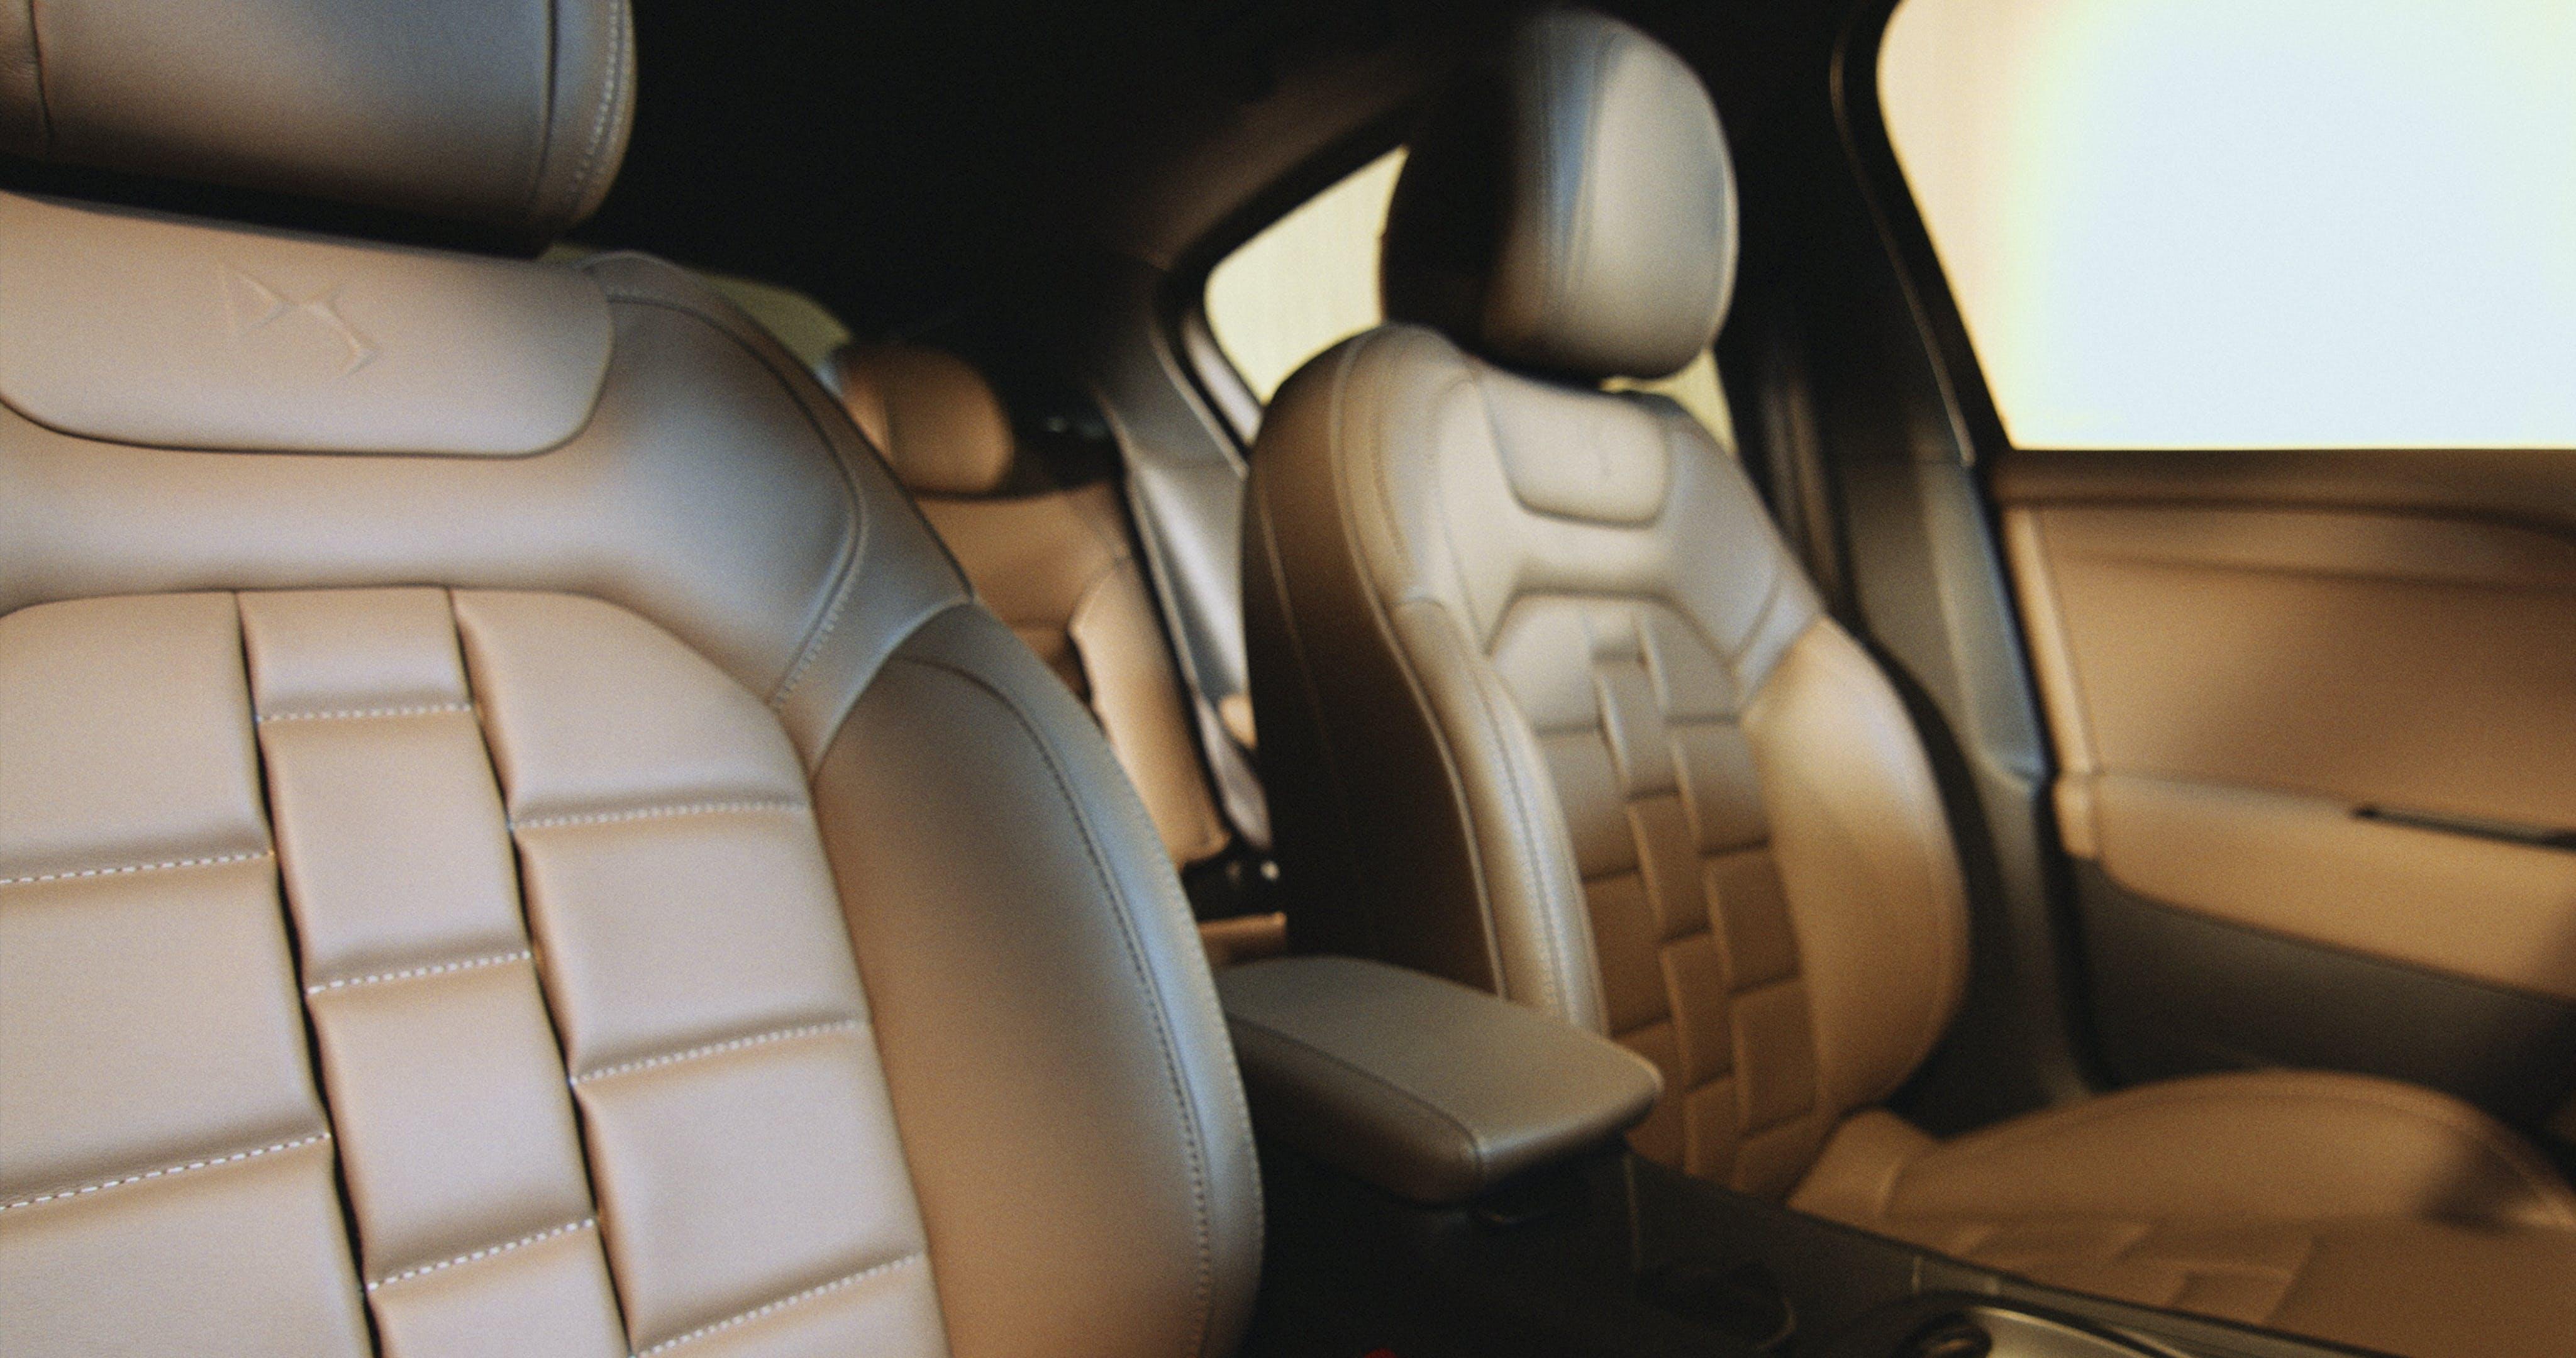 Free stock photo of car interior, leather seat, luxury car